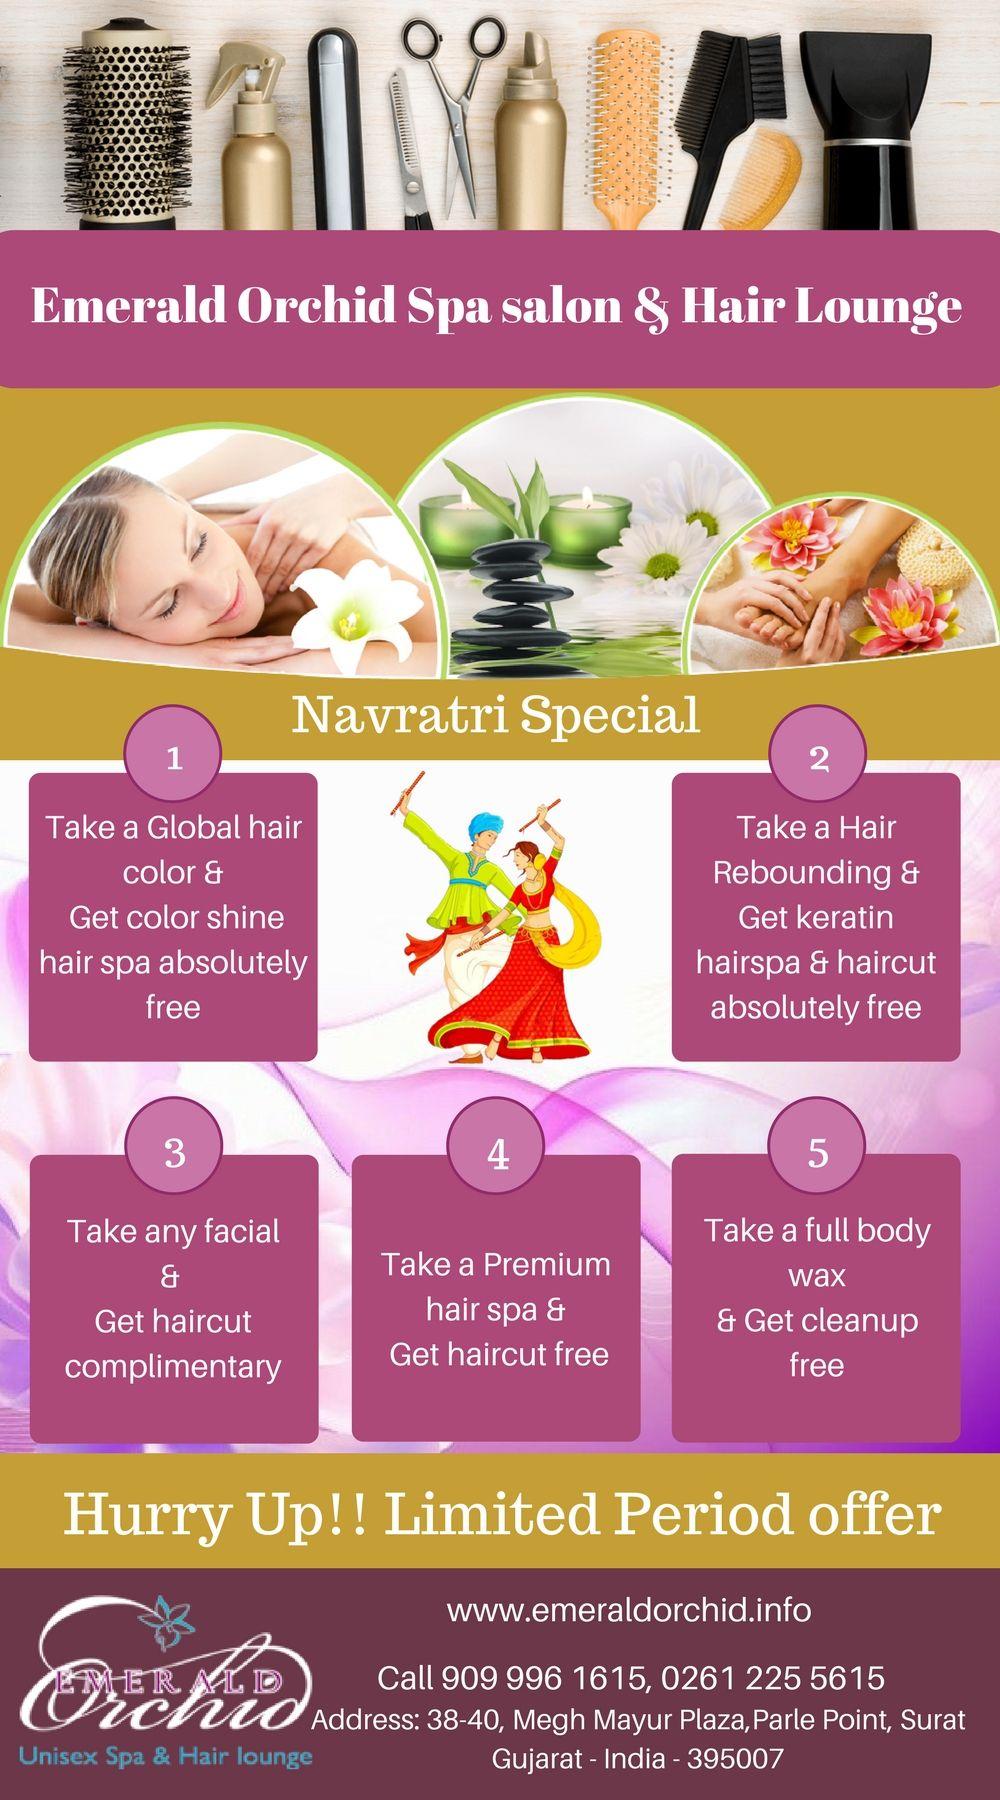 Hurry Up Navratri Special Offers Make Your Navratri Special